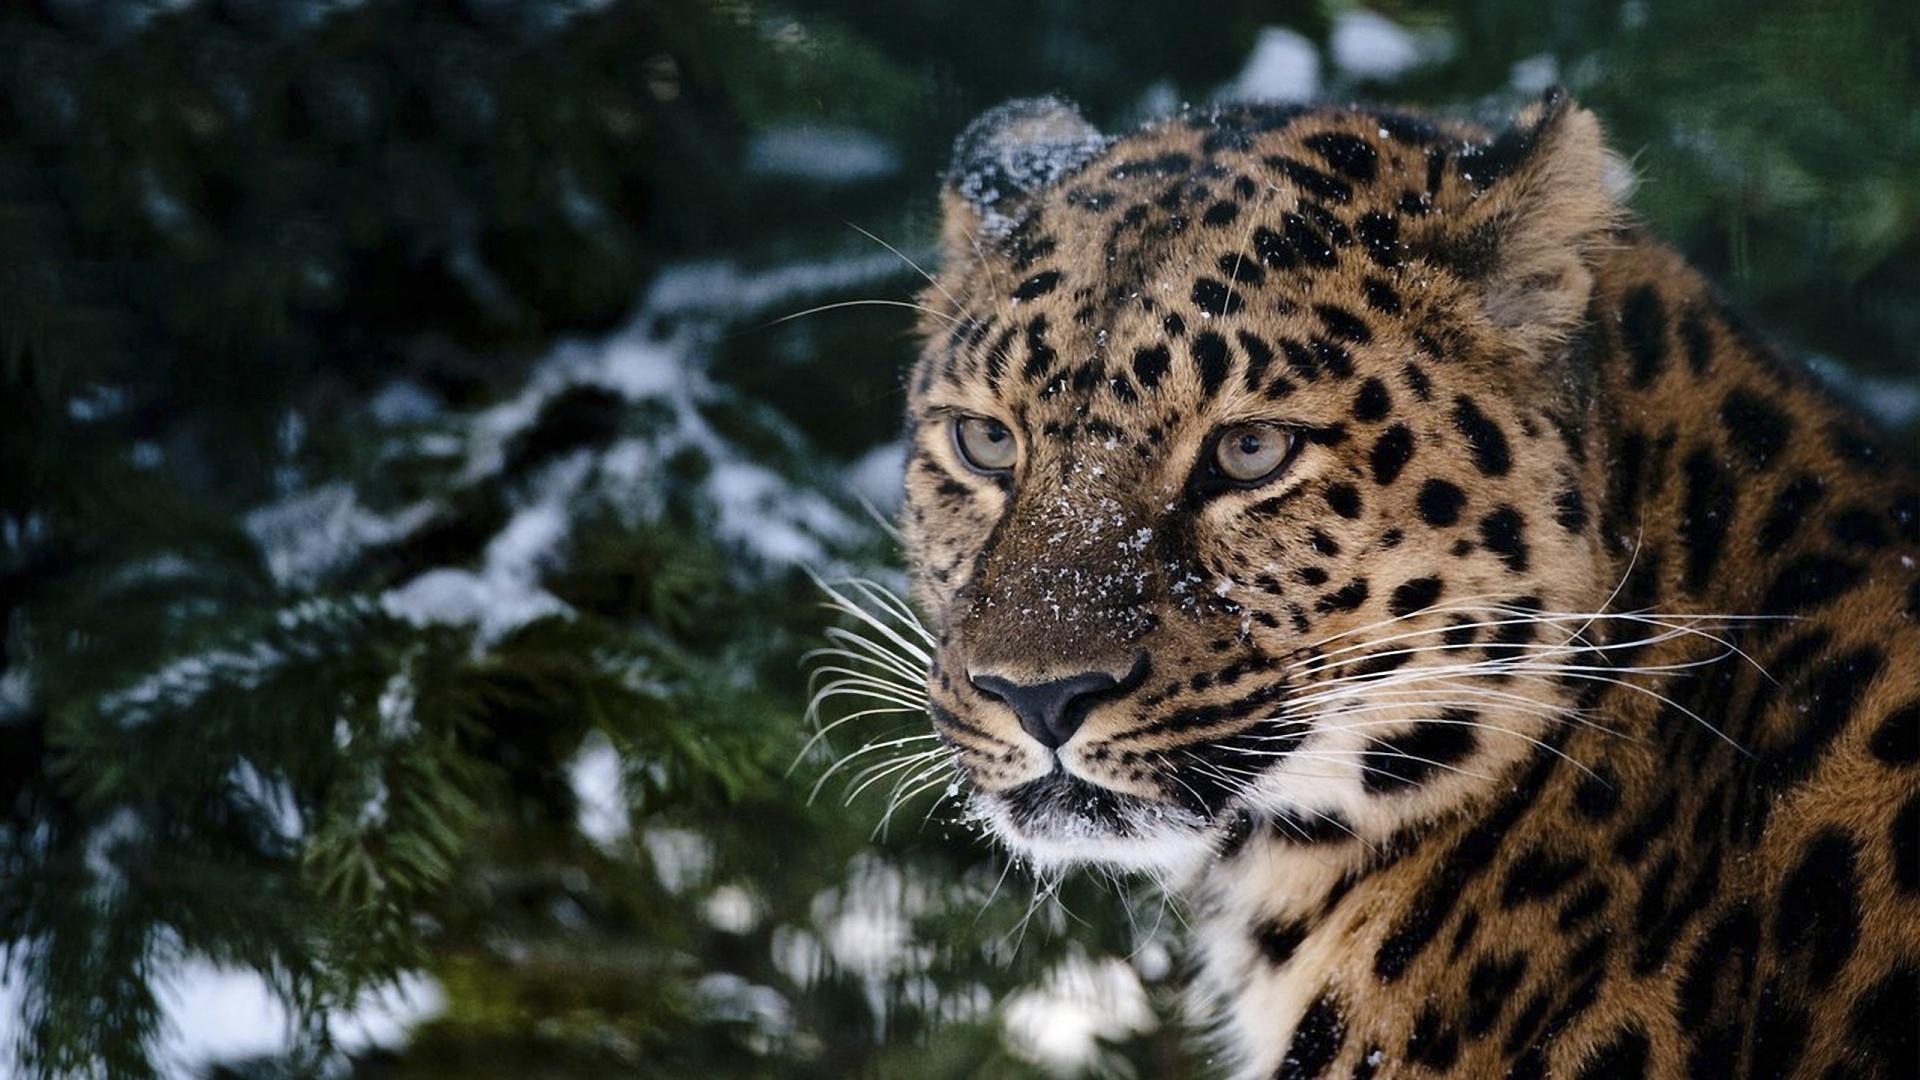 Snow Leopard Hd Wallpaper Wallpapersafari